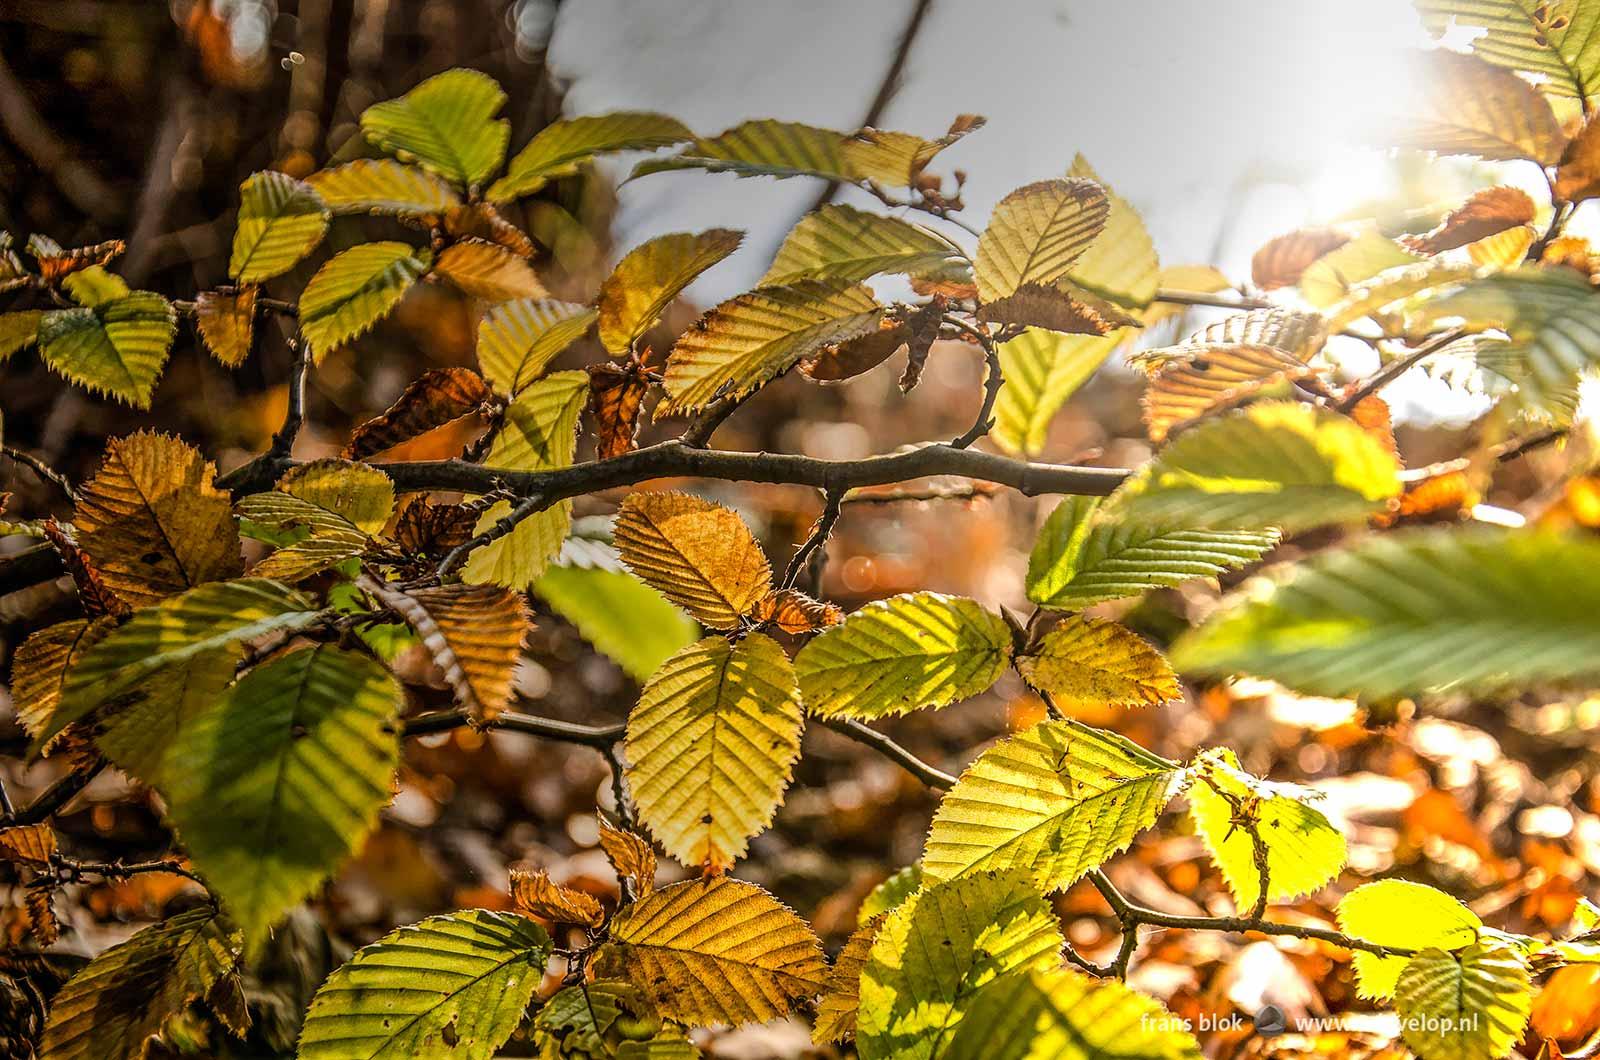 Joyful autumn image of beech leaves with backlight